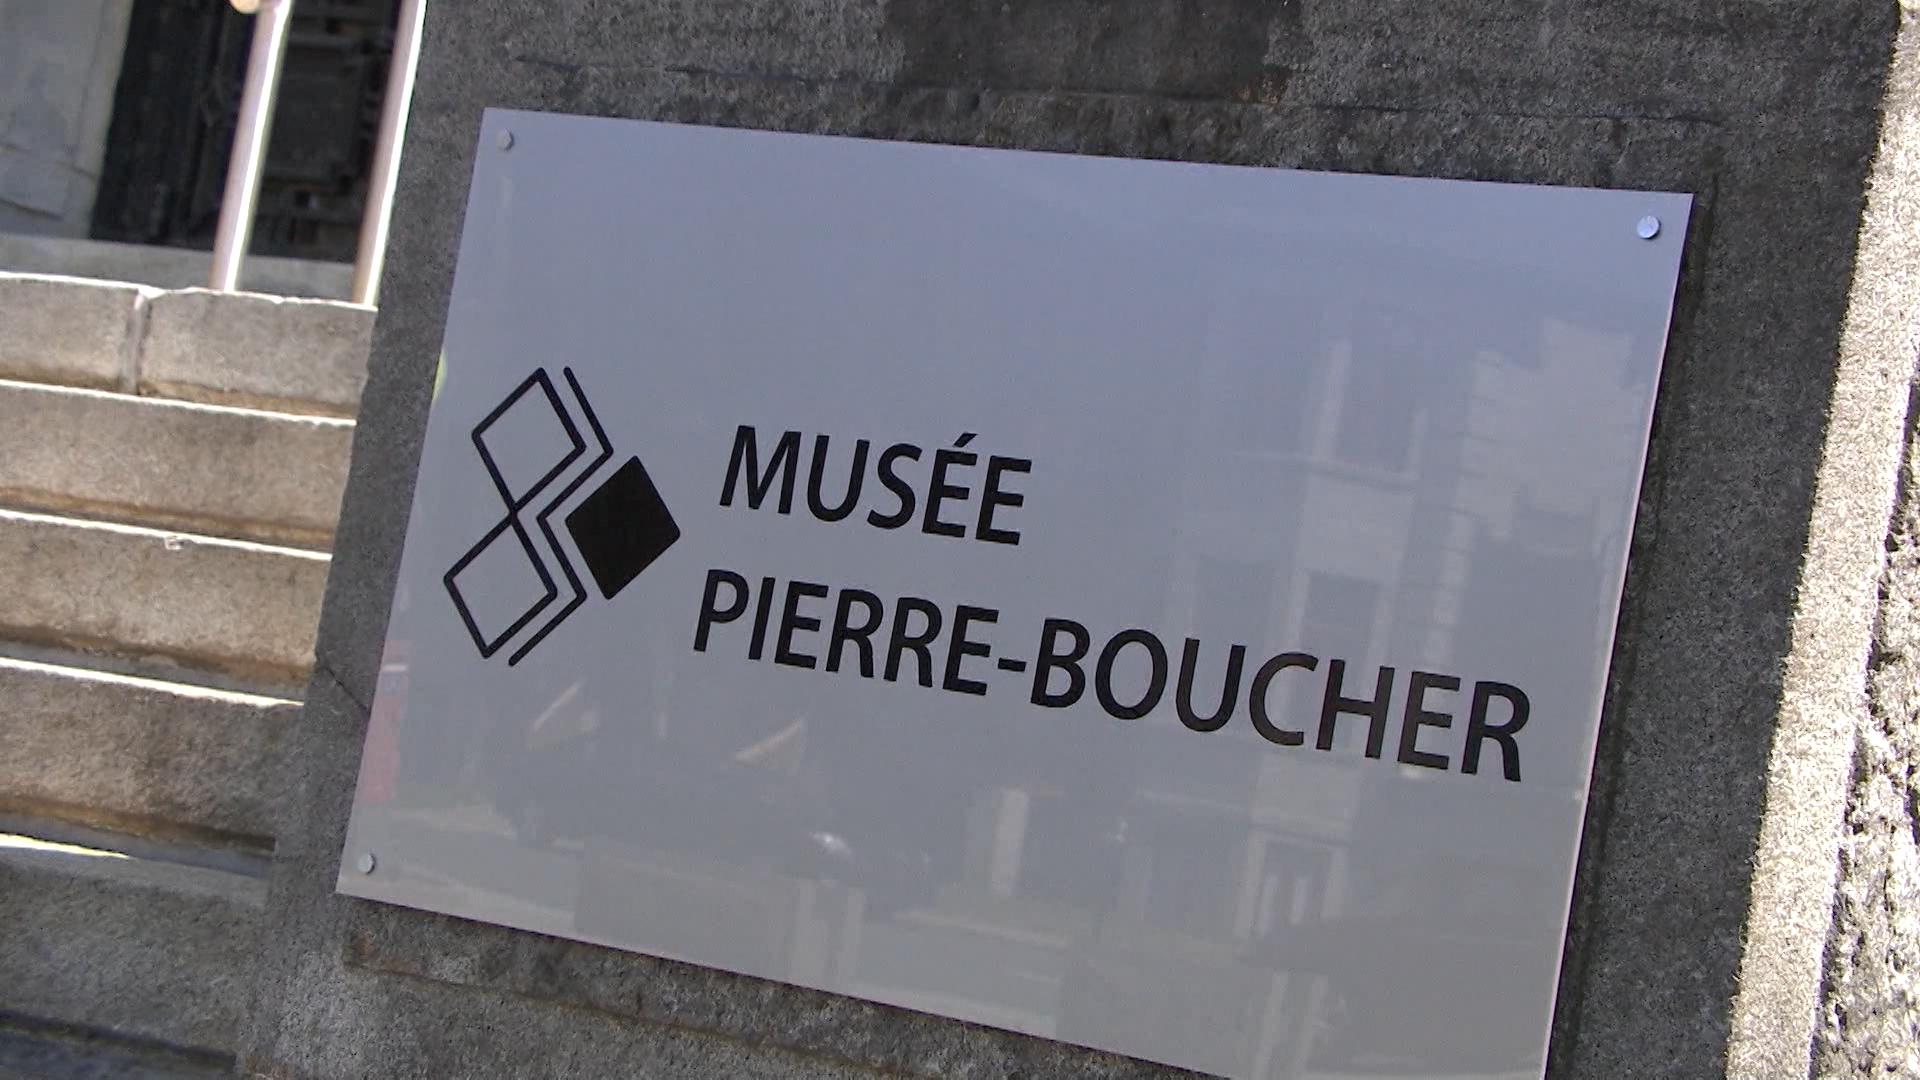 Musée Pierre-Boucher